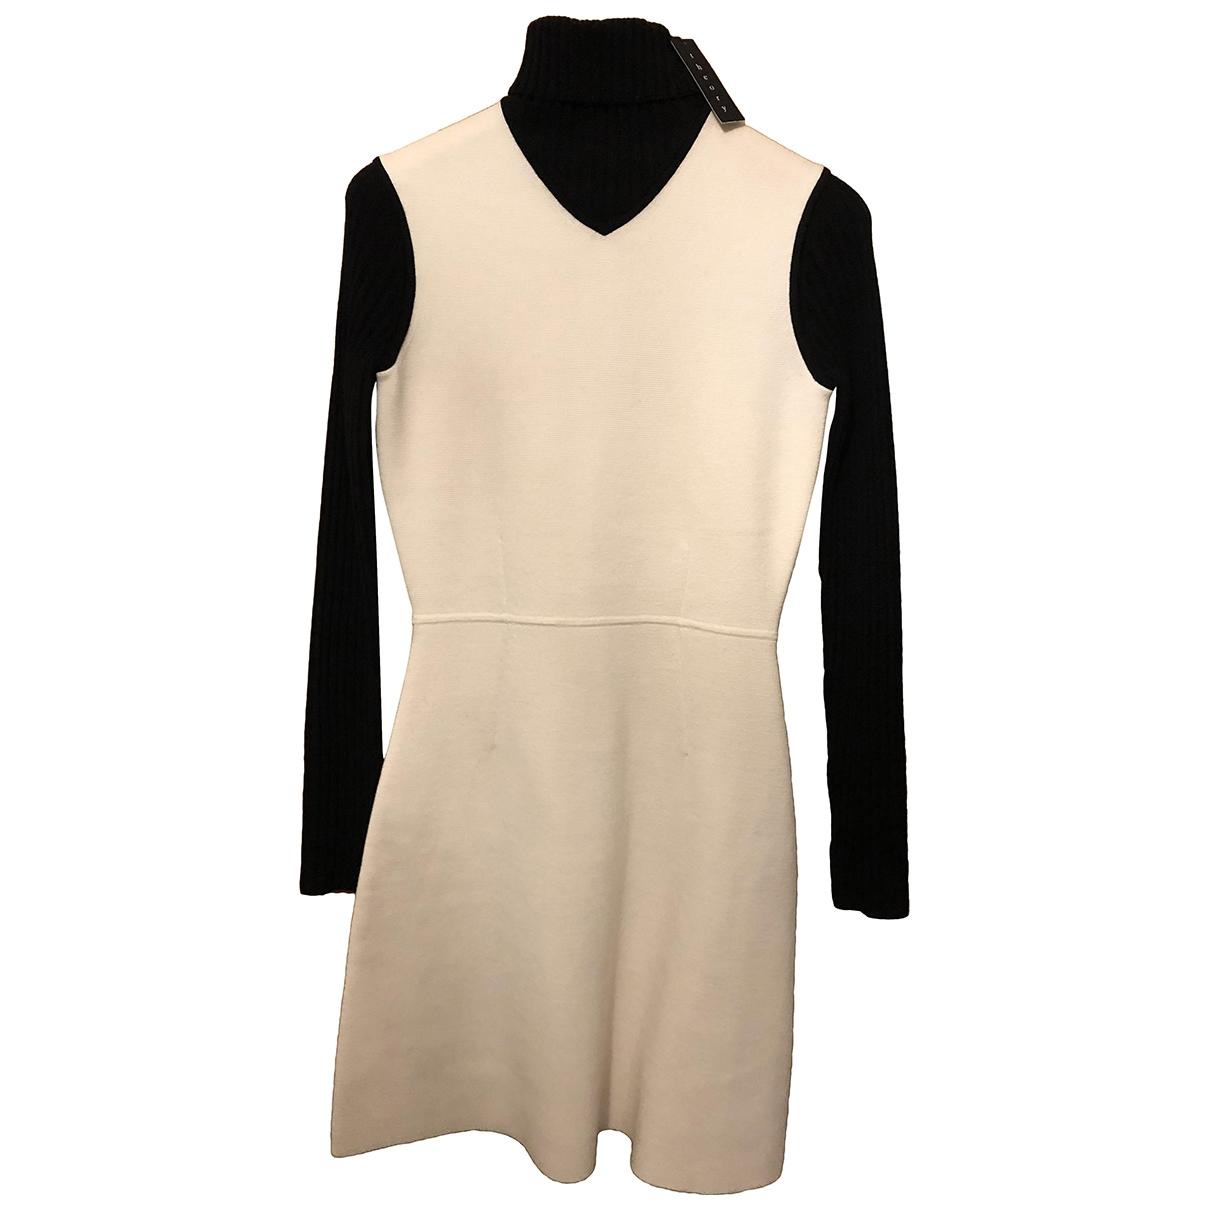 Theory - Robe   pour femme en laine